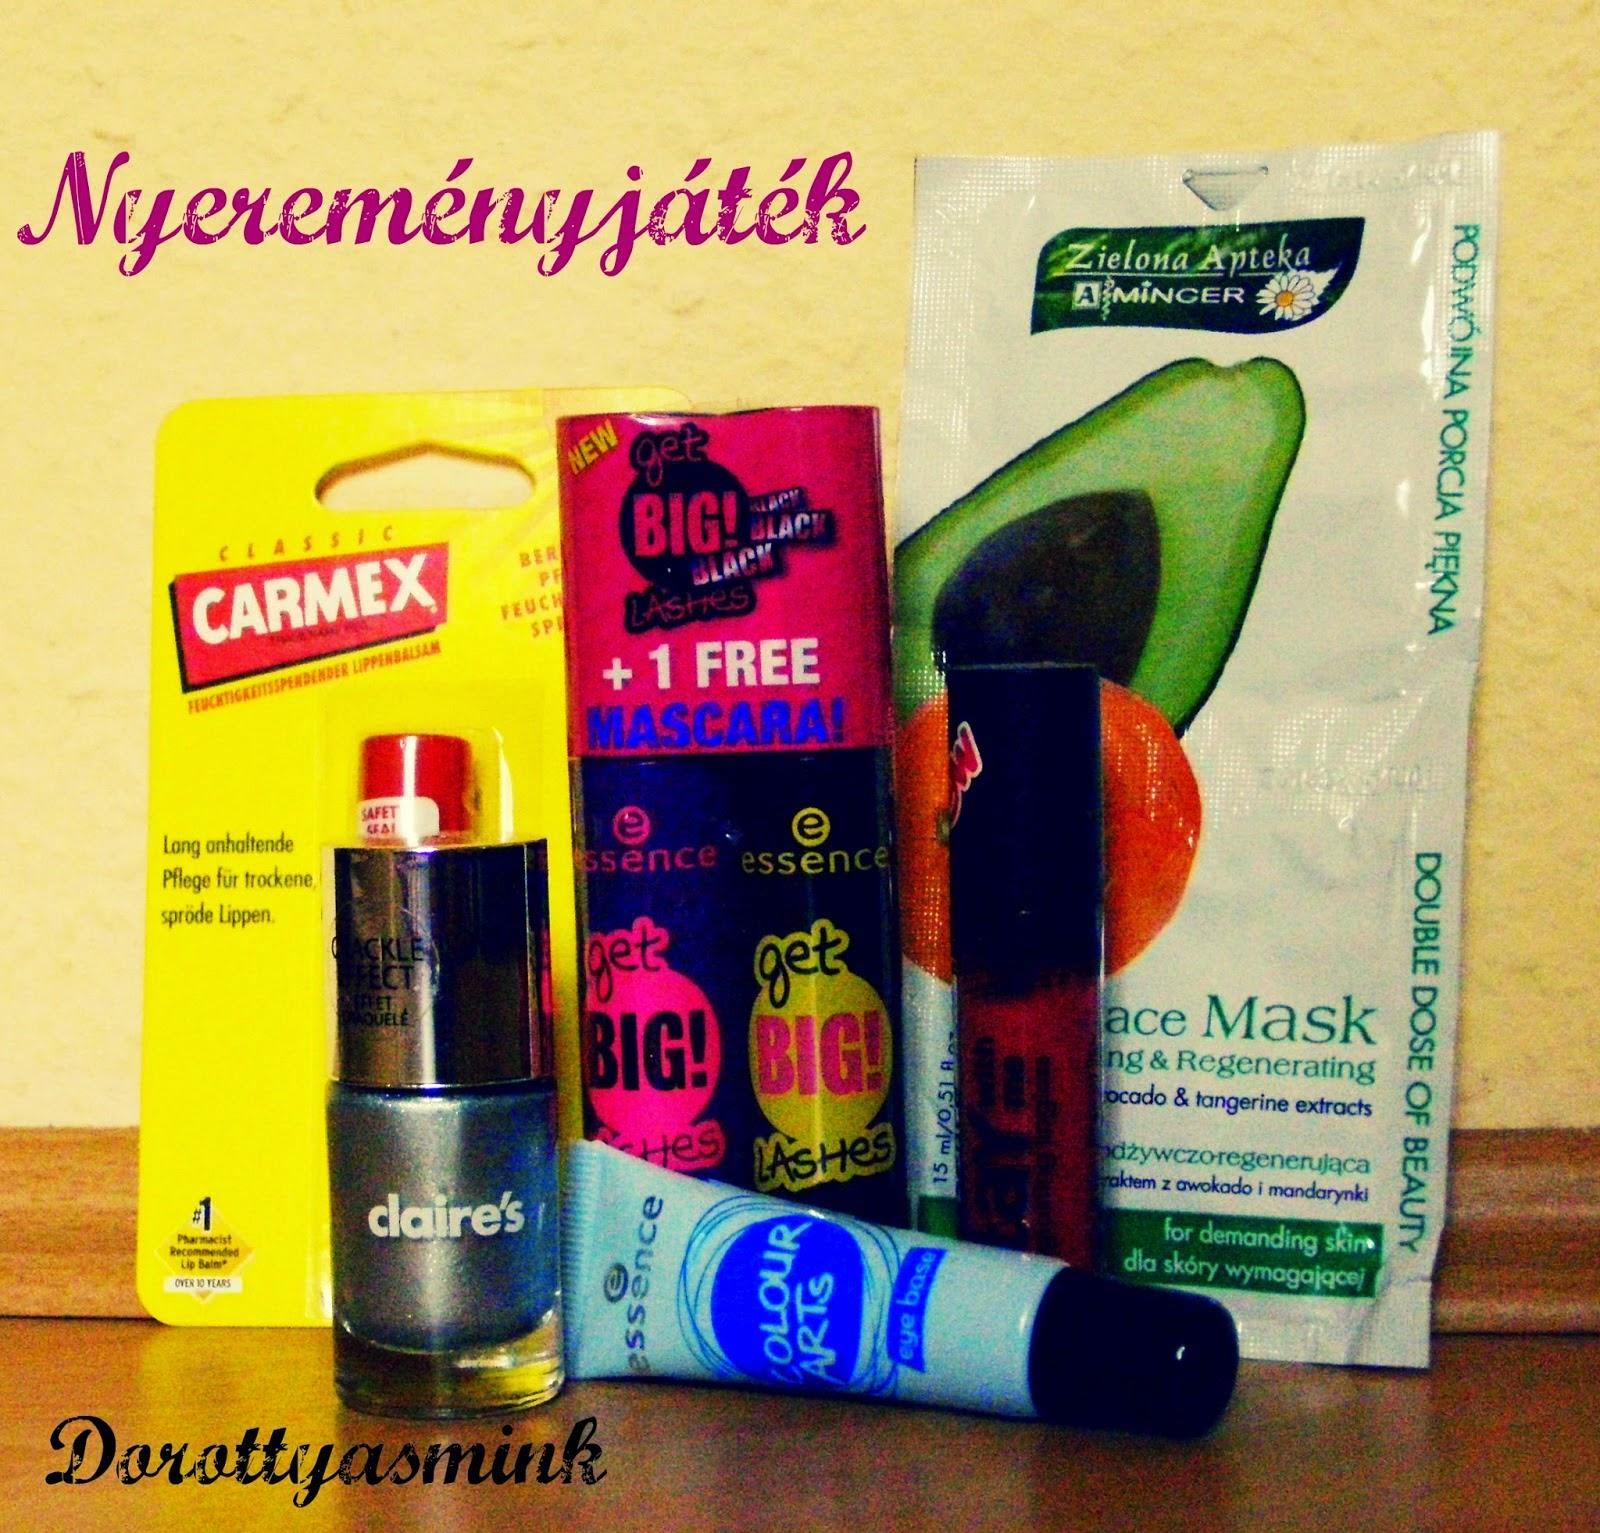 http://dorottyasmink.blogspot.hu/2014/07/500-bejegyzes-nyeremenyjatek.html